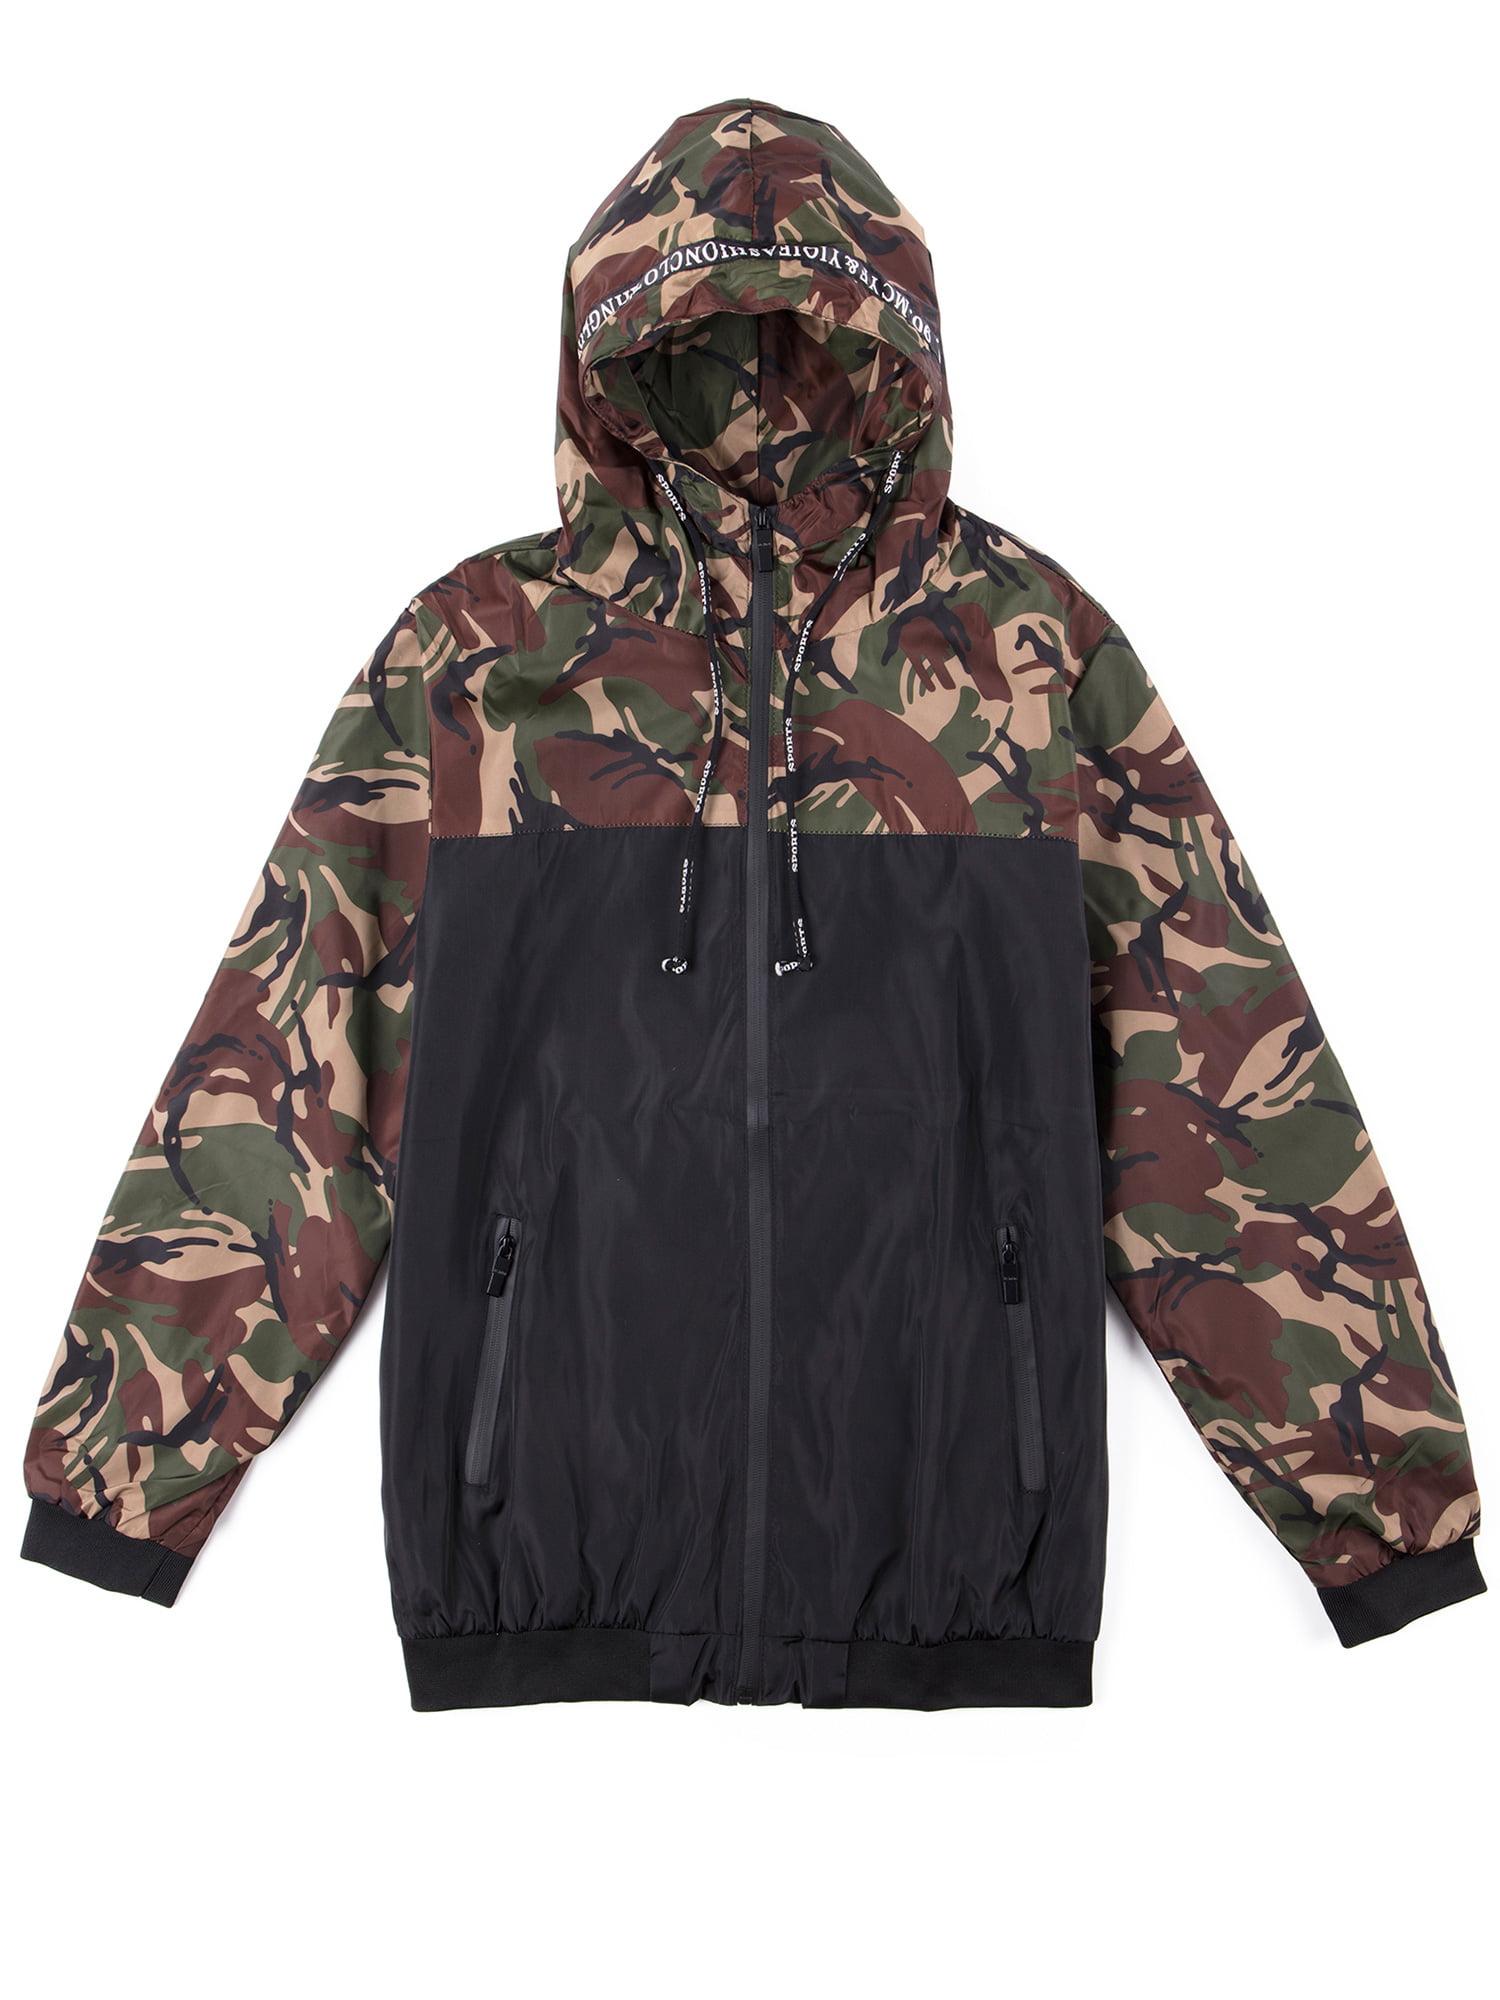 6e77252352fc9 SAYFUT - Big and Tall Men's Hooded Jackets Zip Up Jacket Camo Sweatshirt  Hooded Windbreaker Jacket Coat Outwear M-6XL - Walmart.com